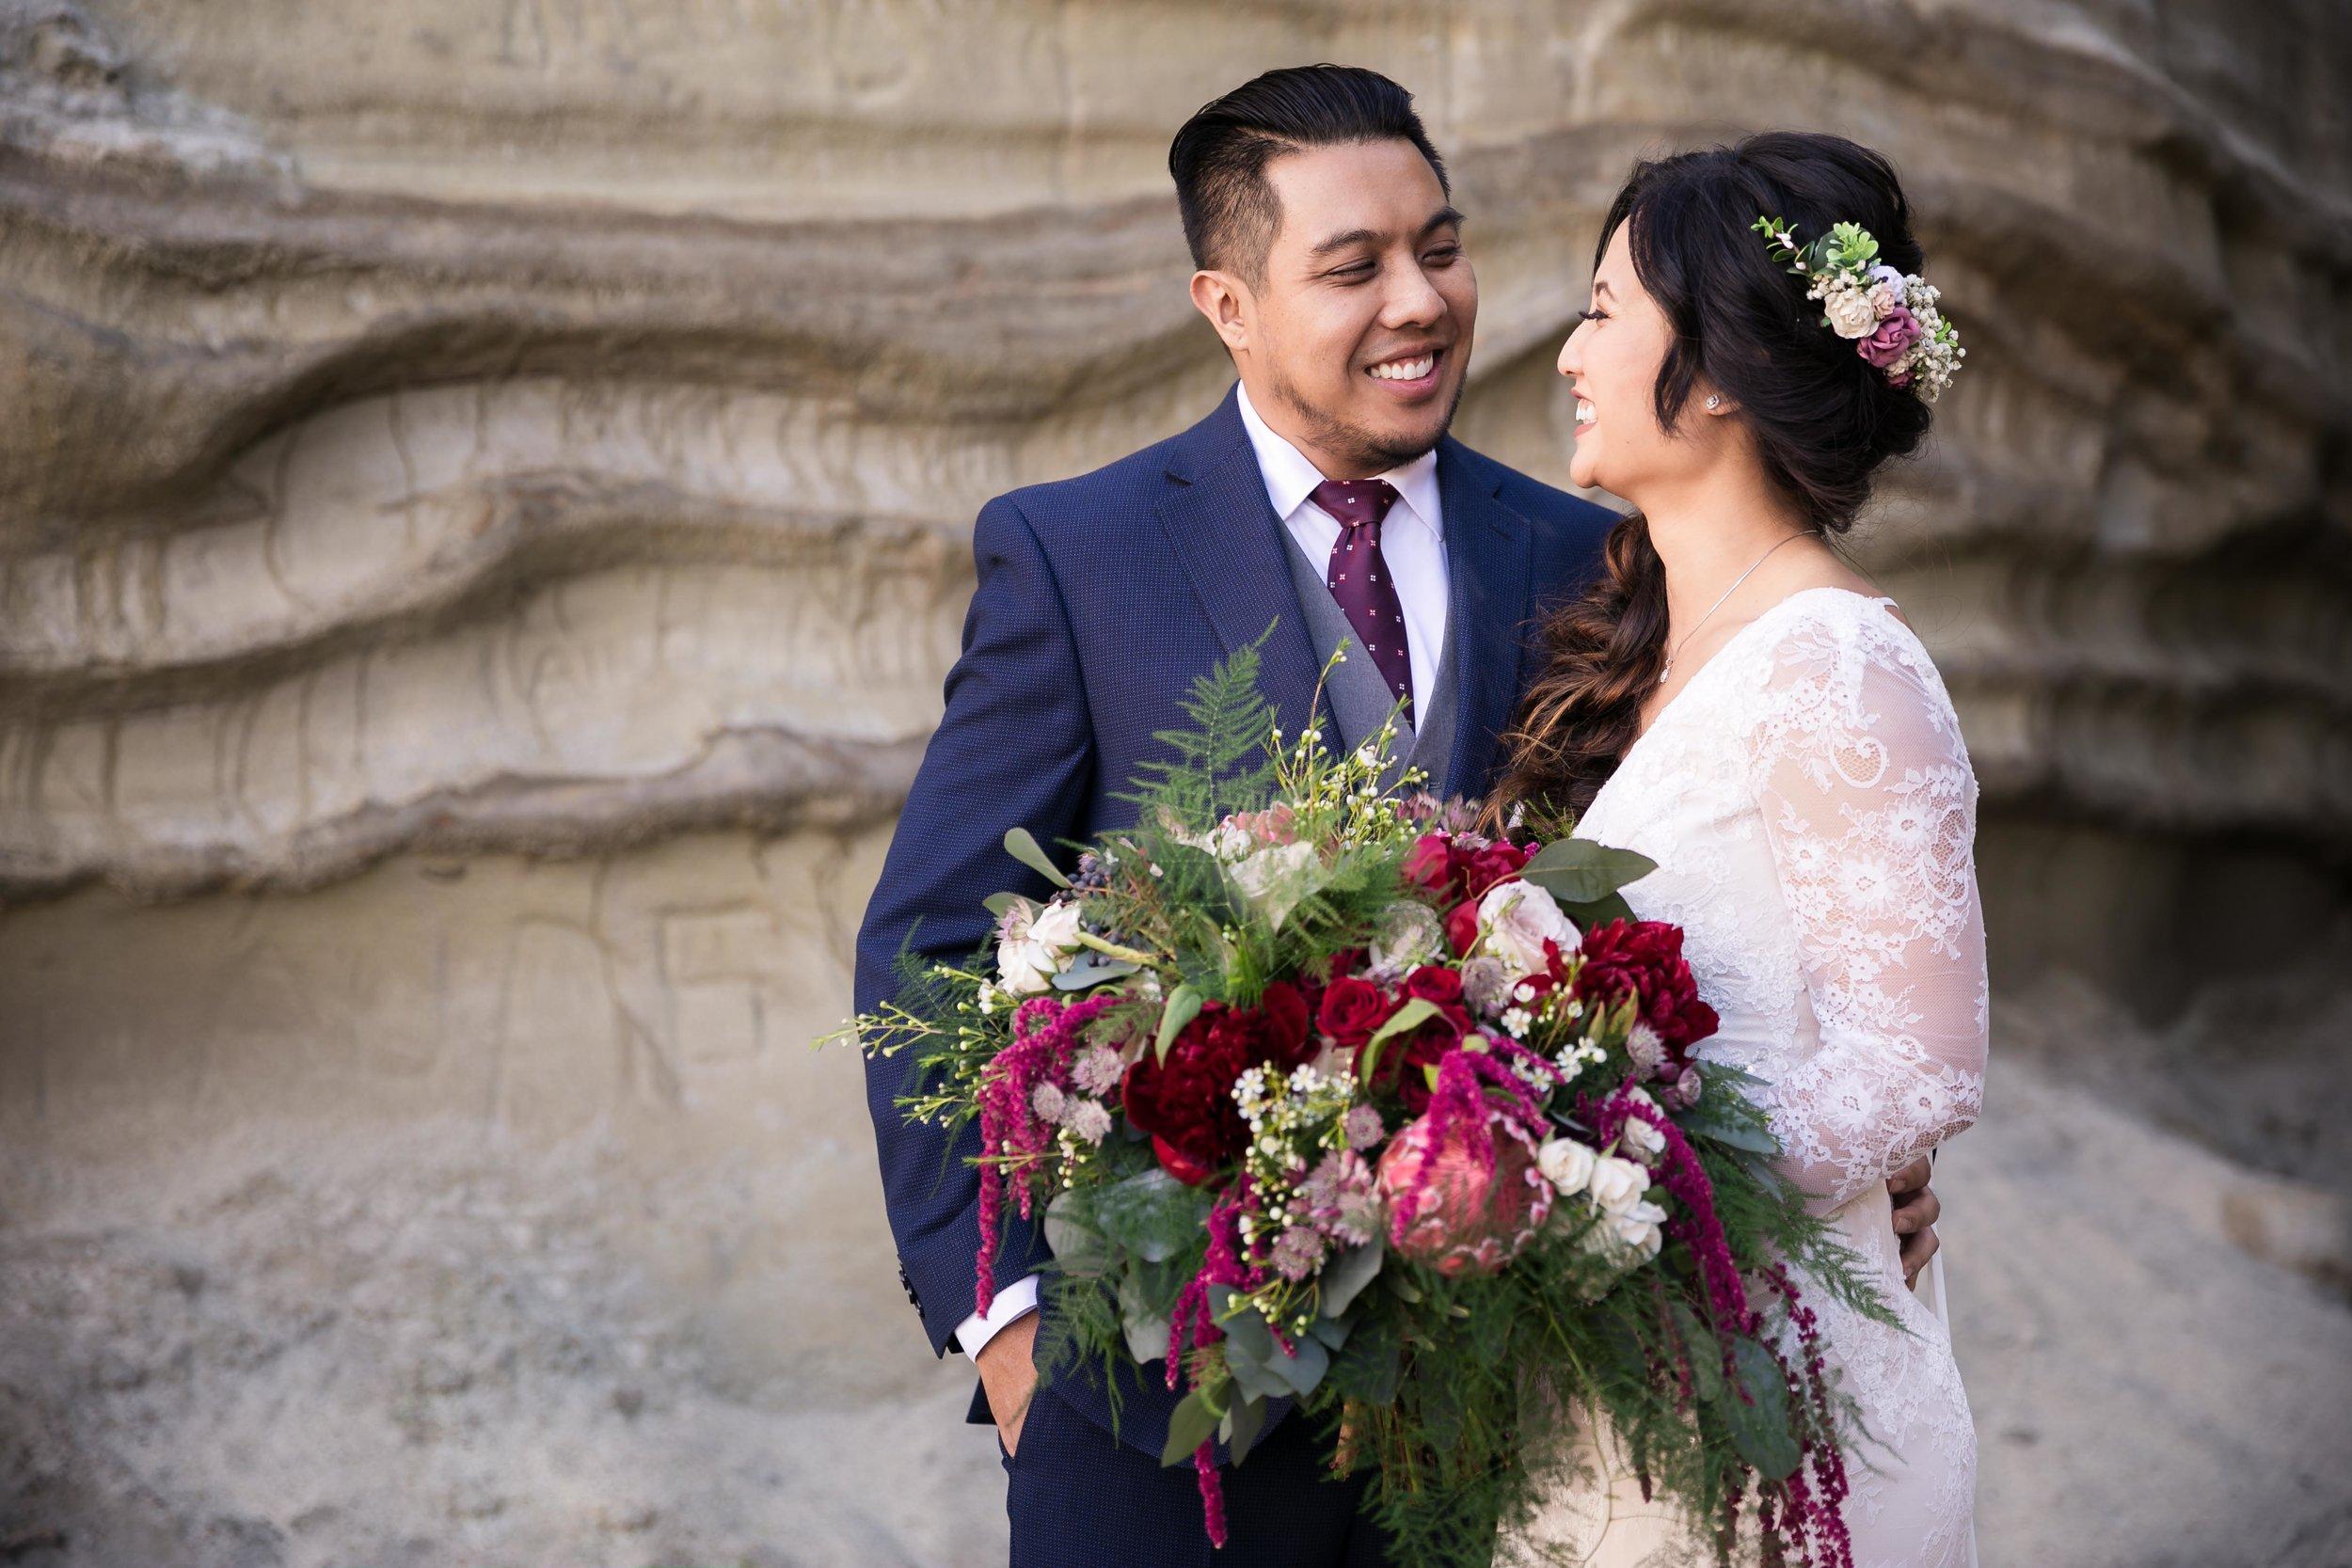 southern_california_wedding_joshuachun_photography-2.JPG